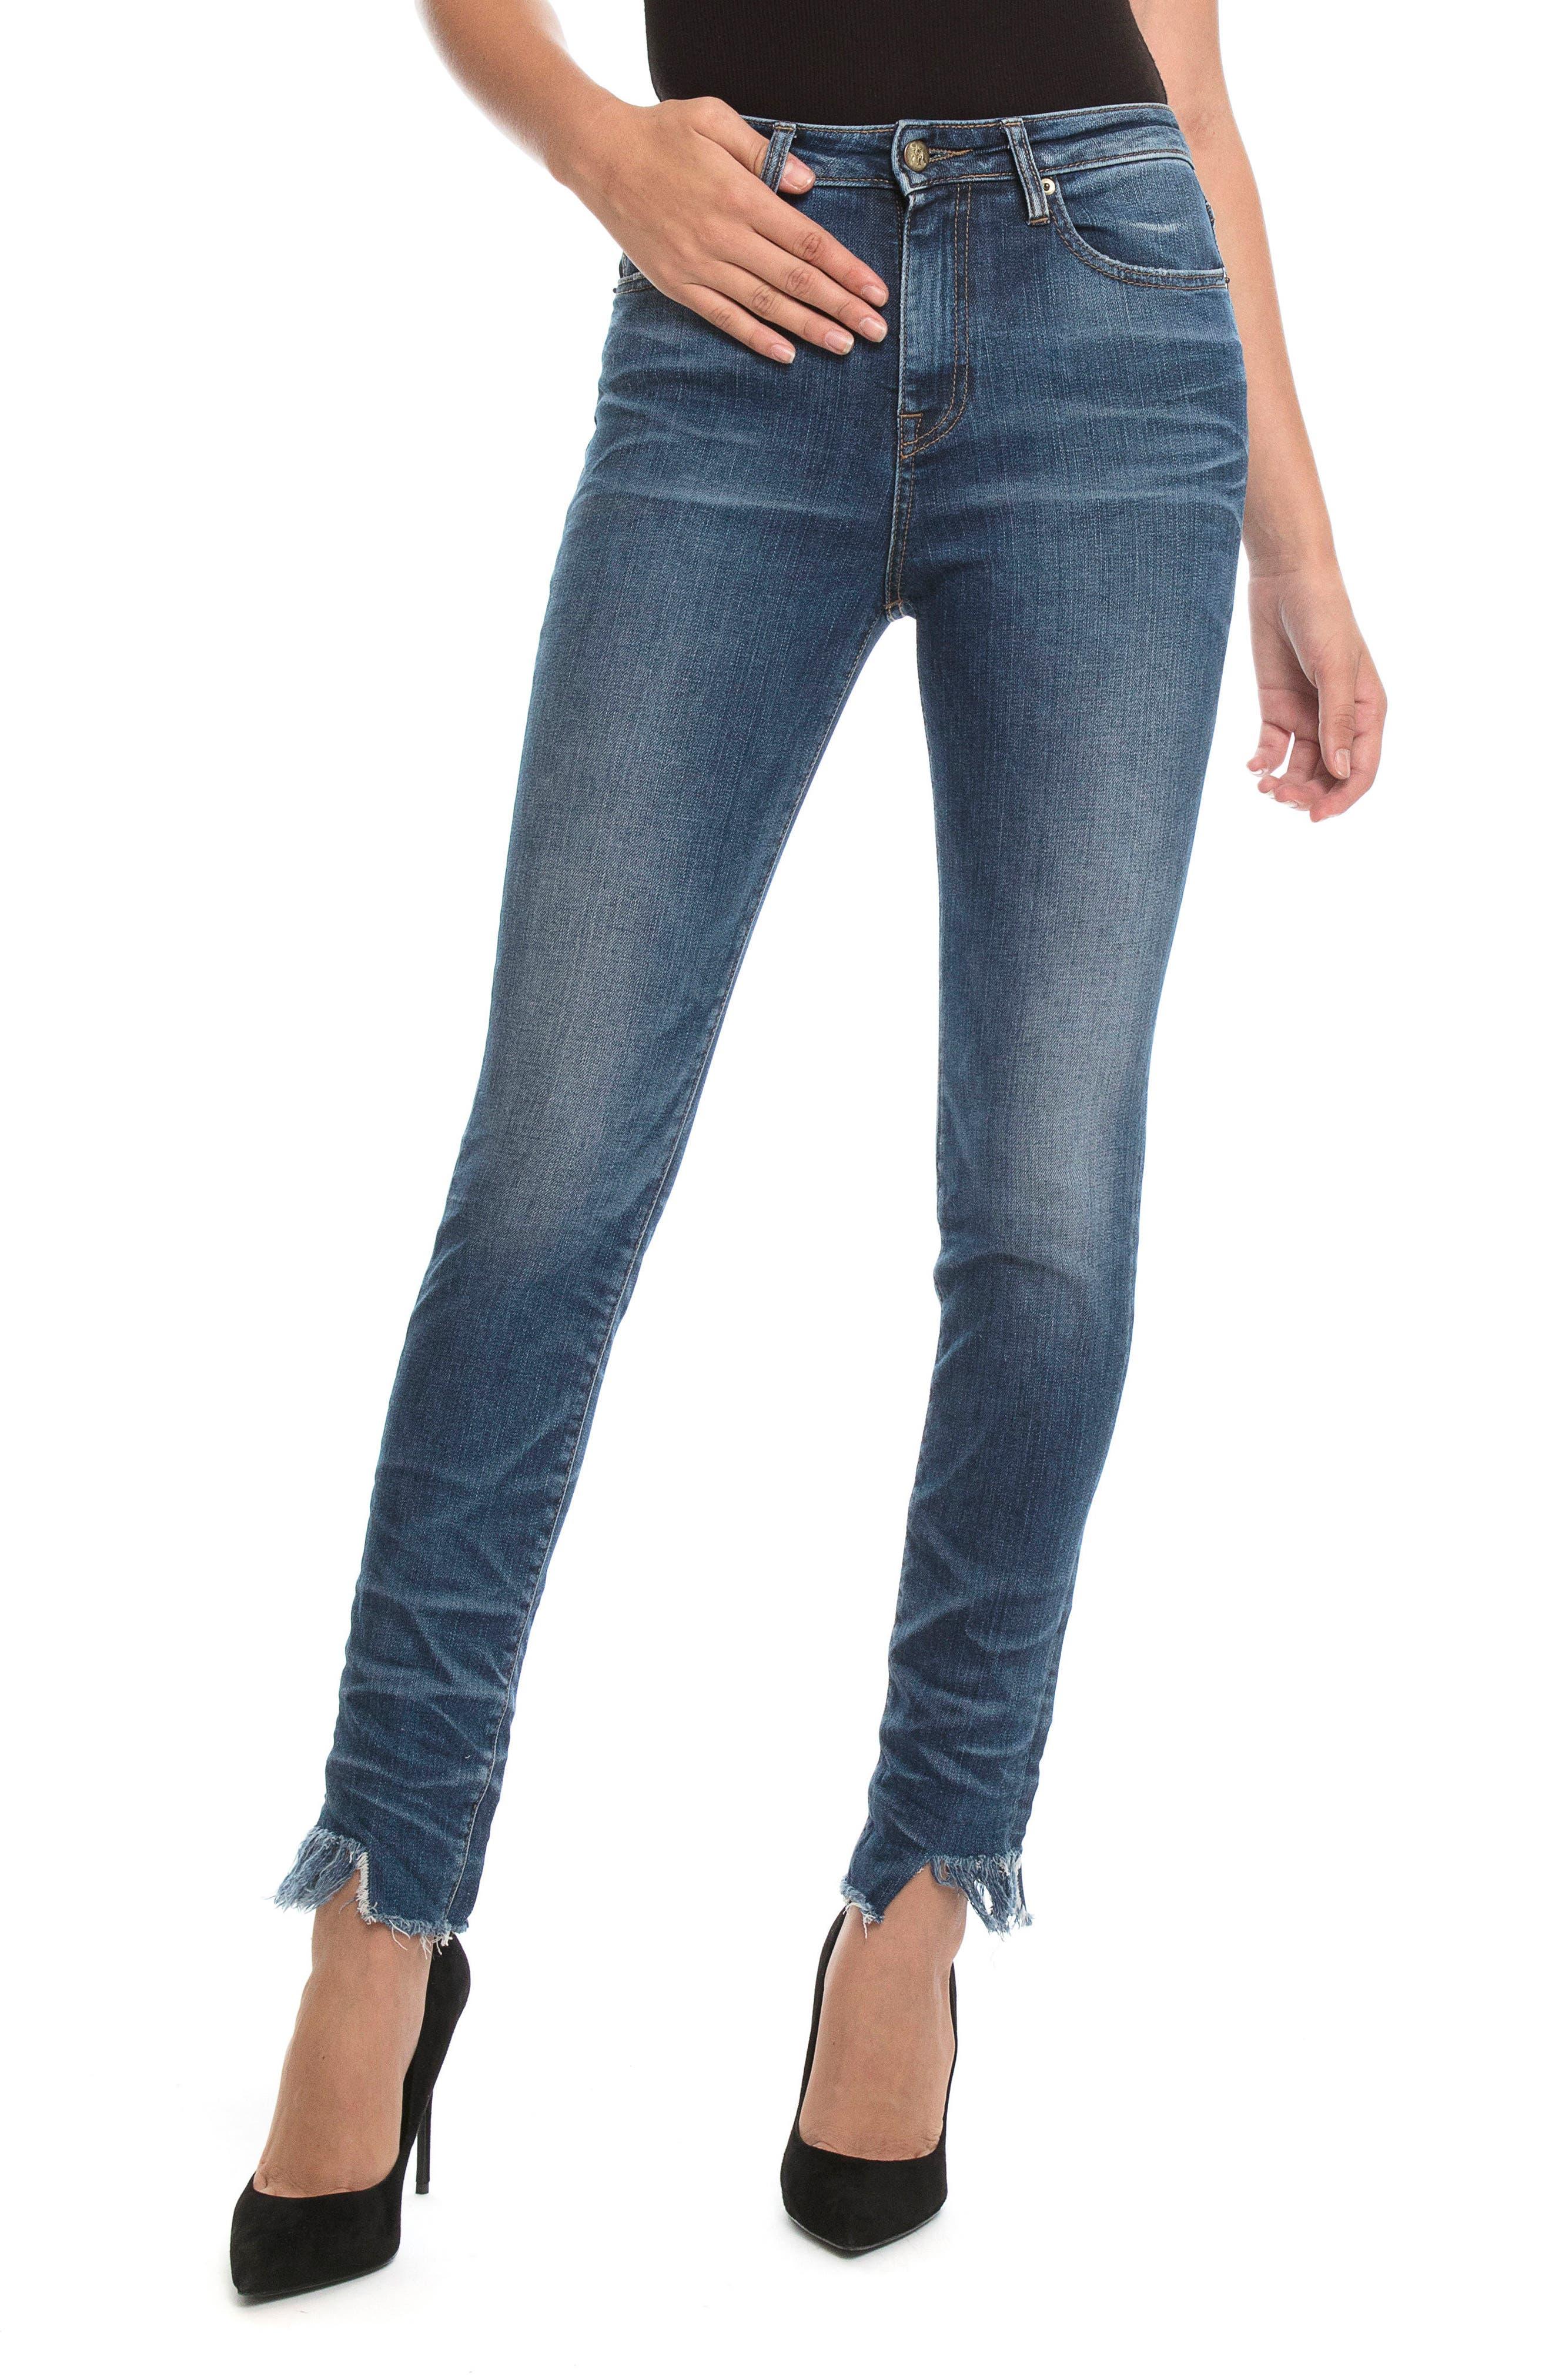 Camaro Ankle Skinny Jeans,                         Main,                         color, Vintage